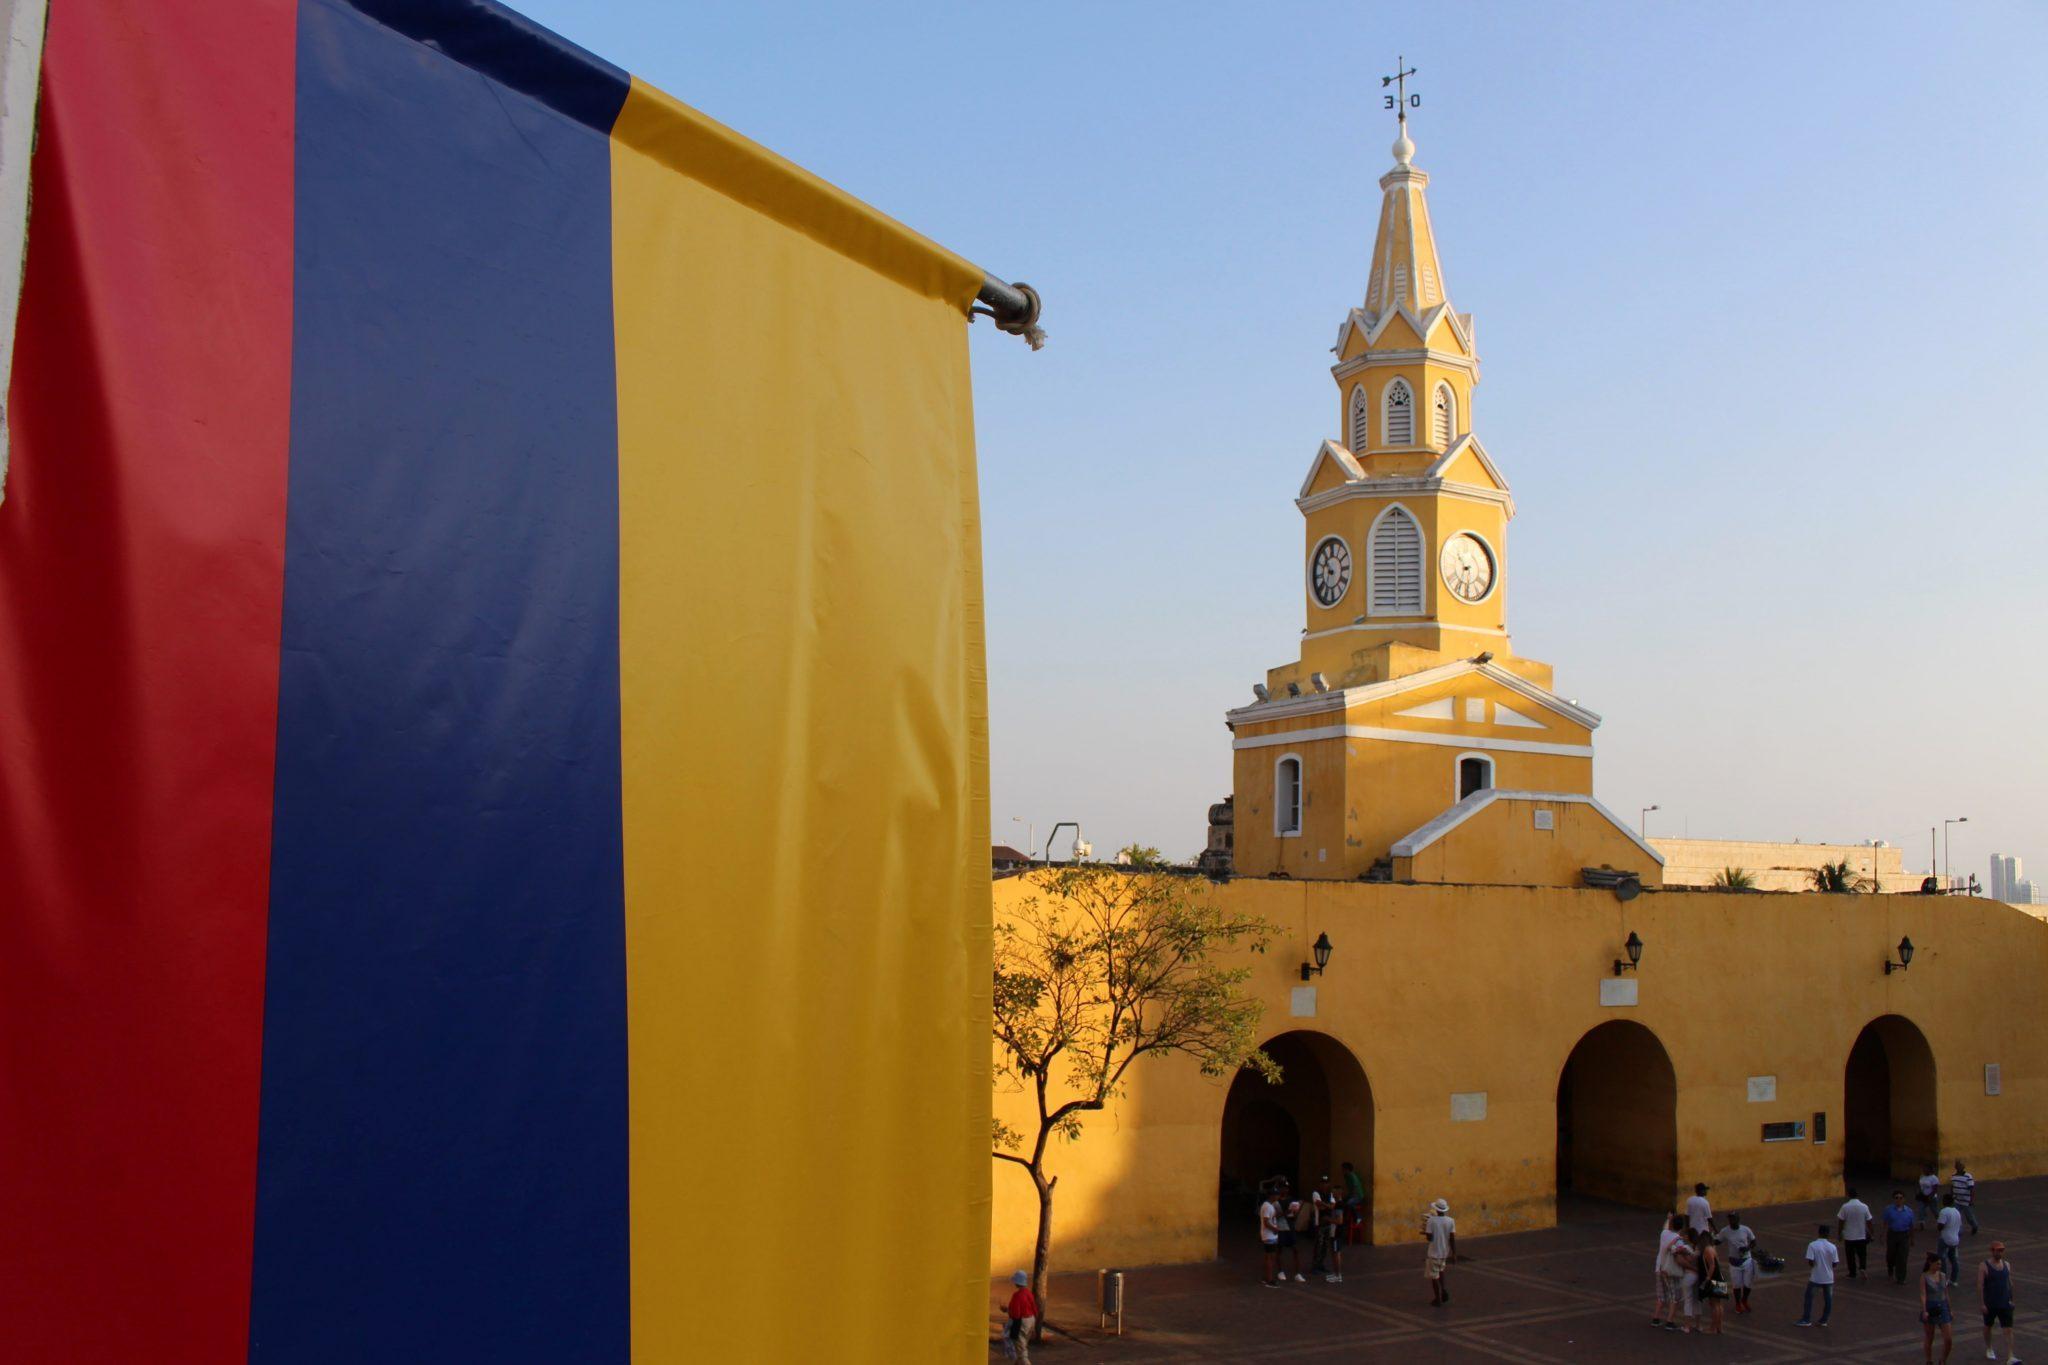 Toren Cartagena entree